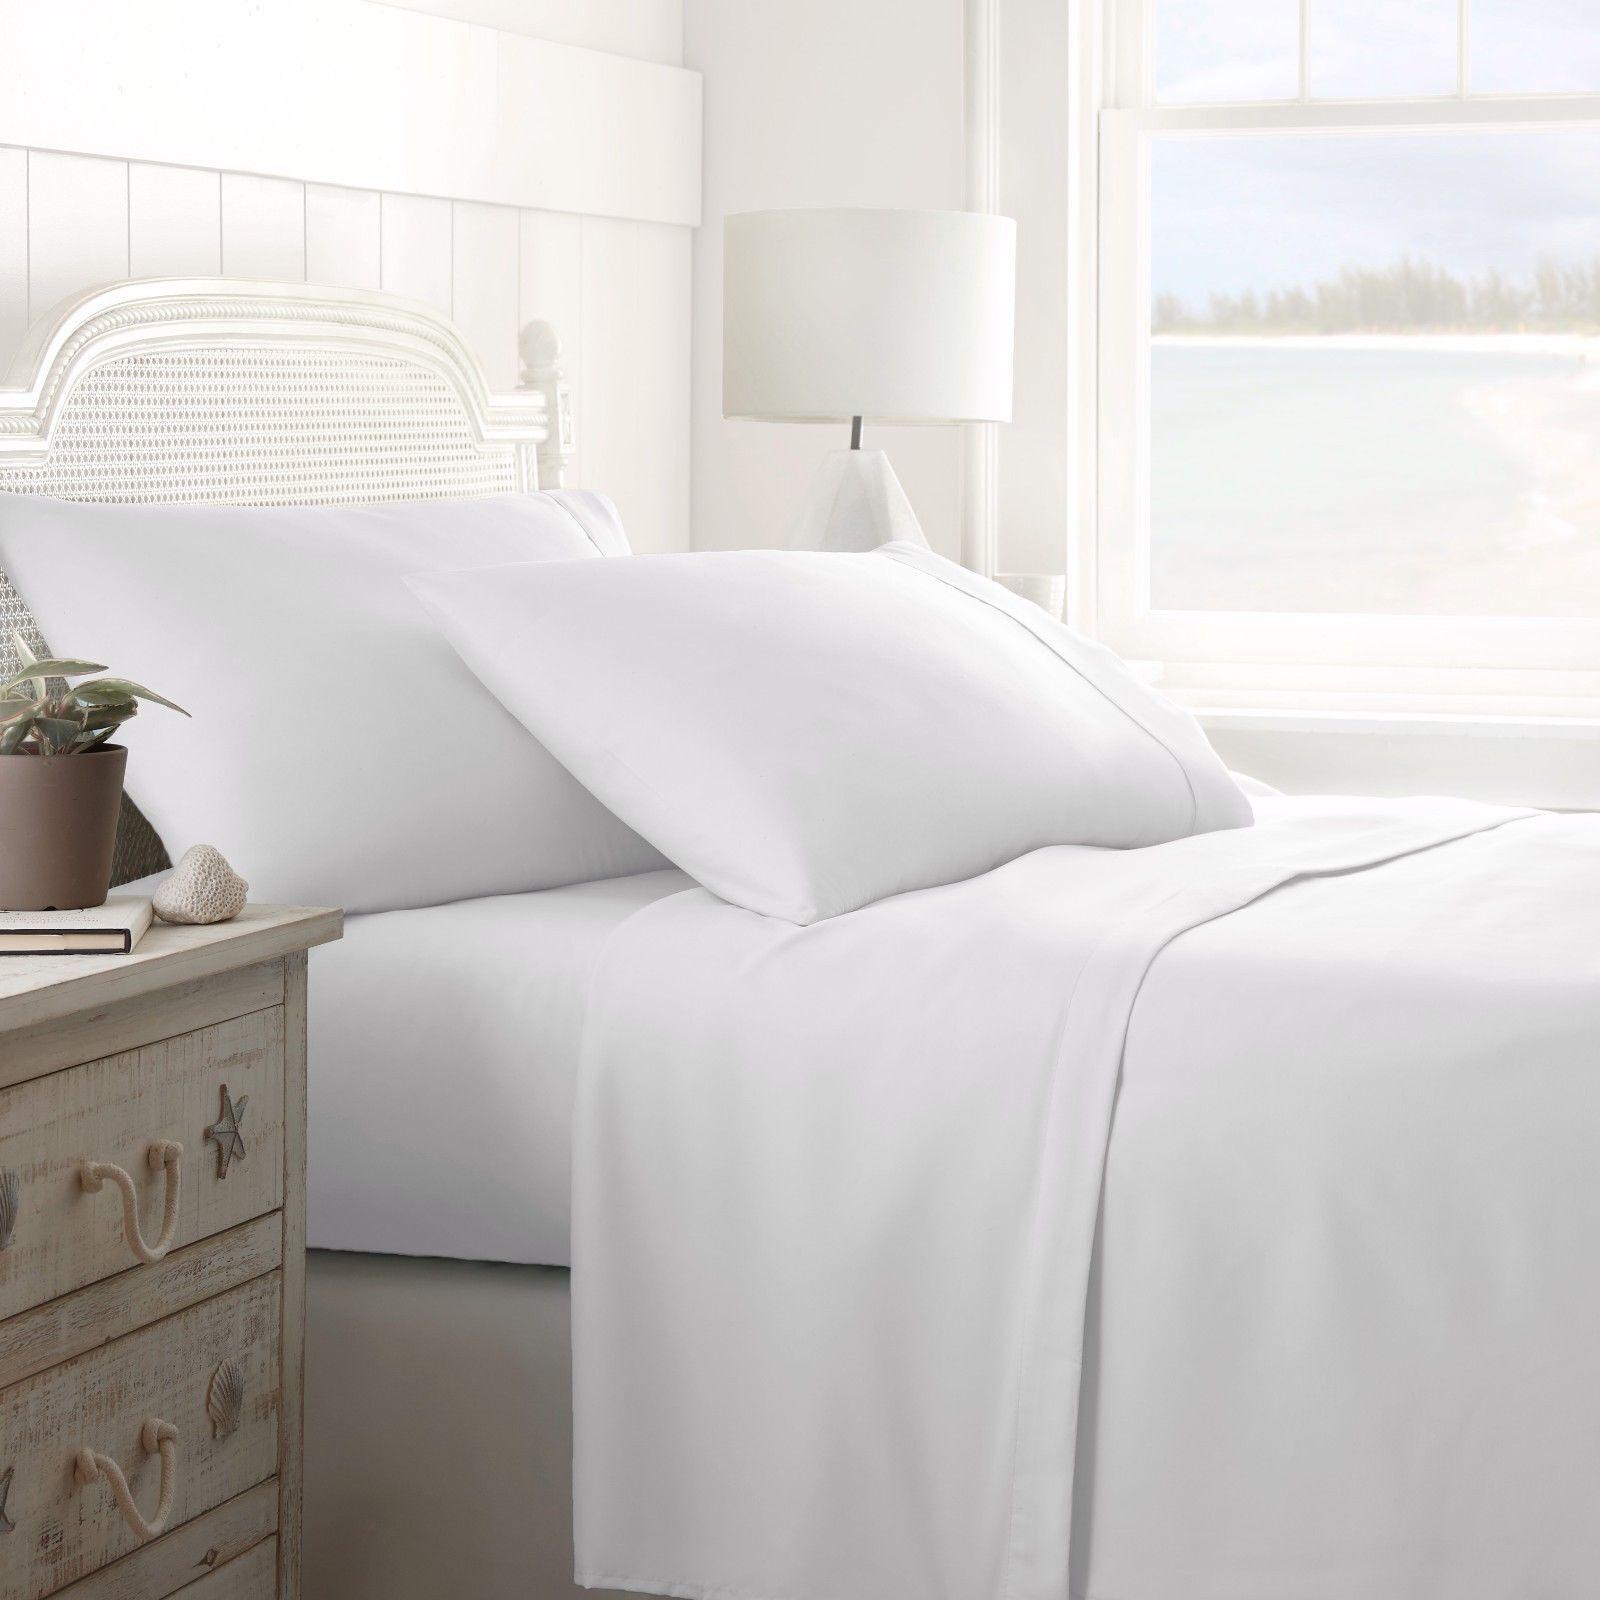 White Solid Extra Deep Pkt Sheet set 1000TC Egyptian Cotton